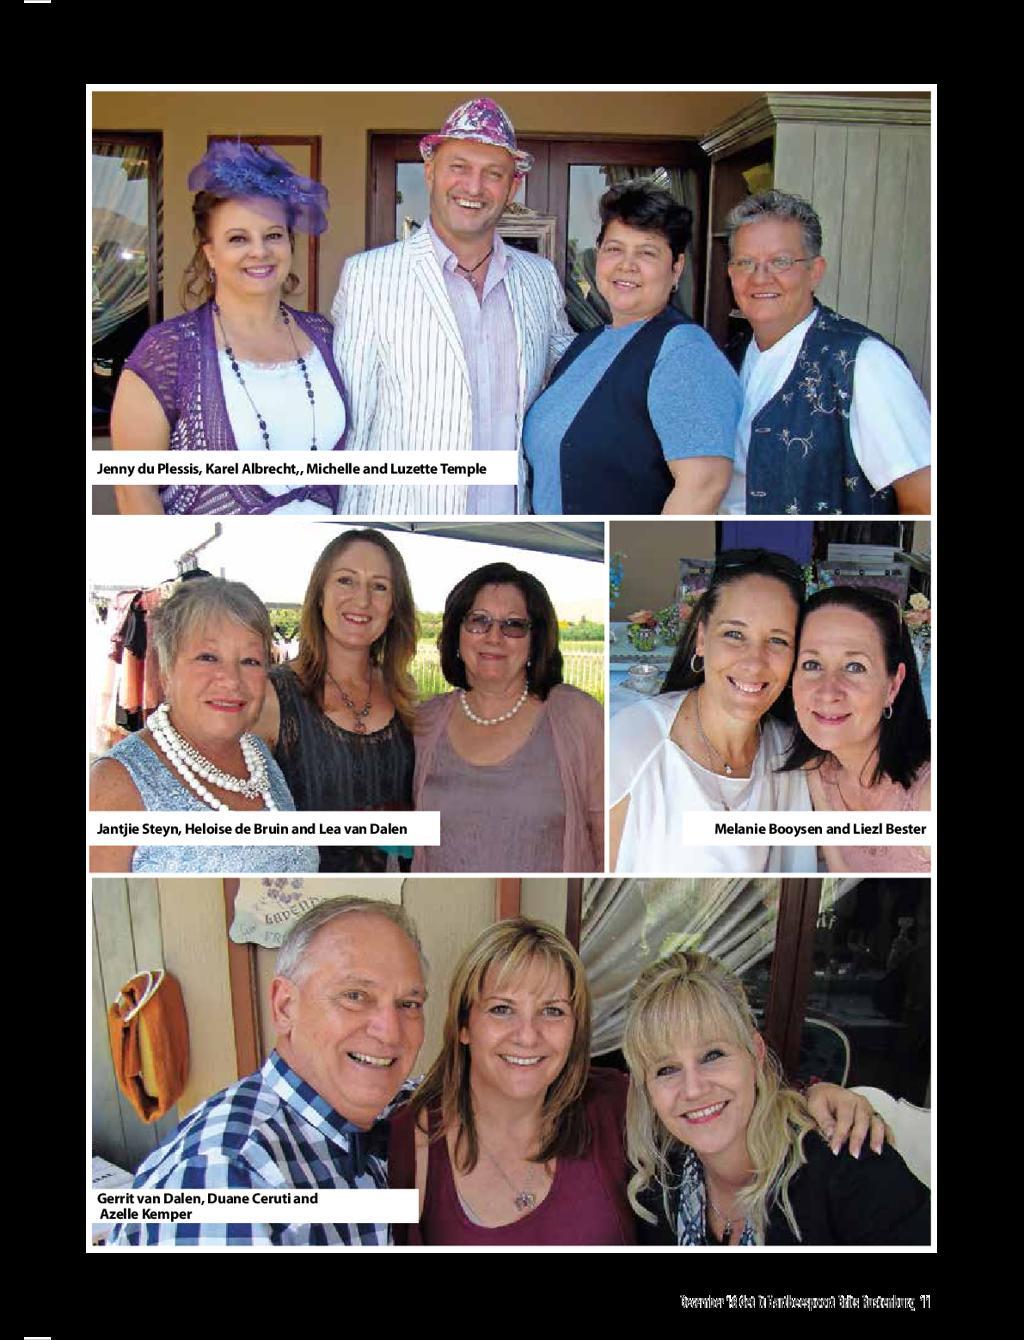 get-it-hartbeespoort-december-2016-epapers-page-13